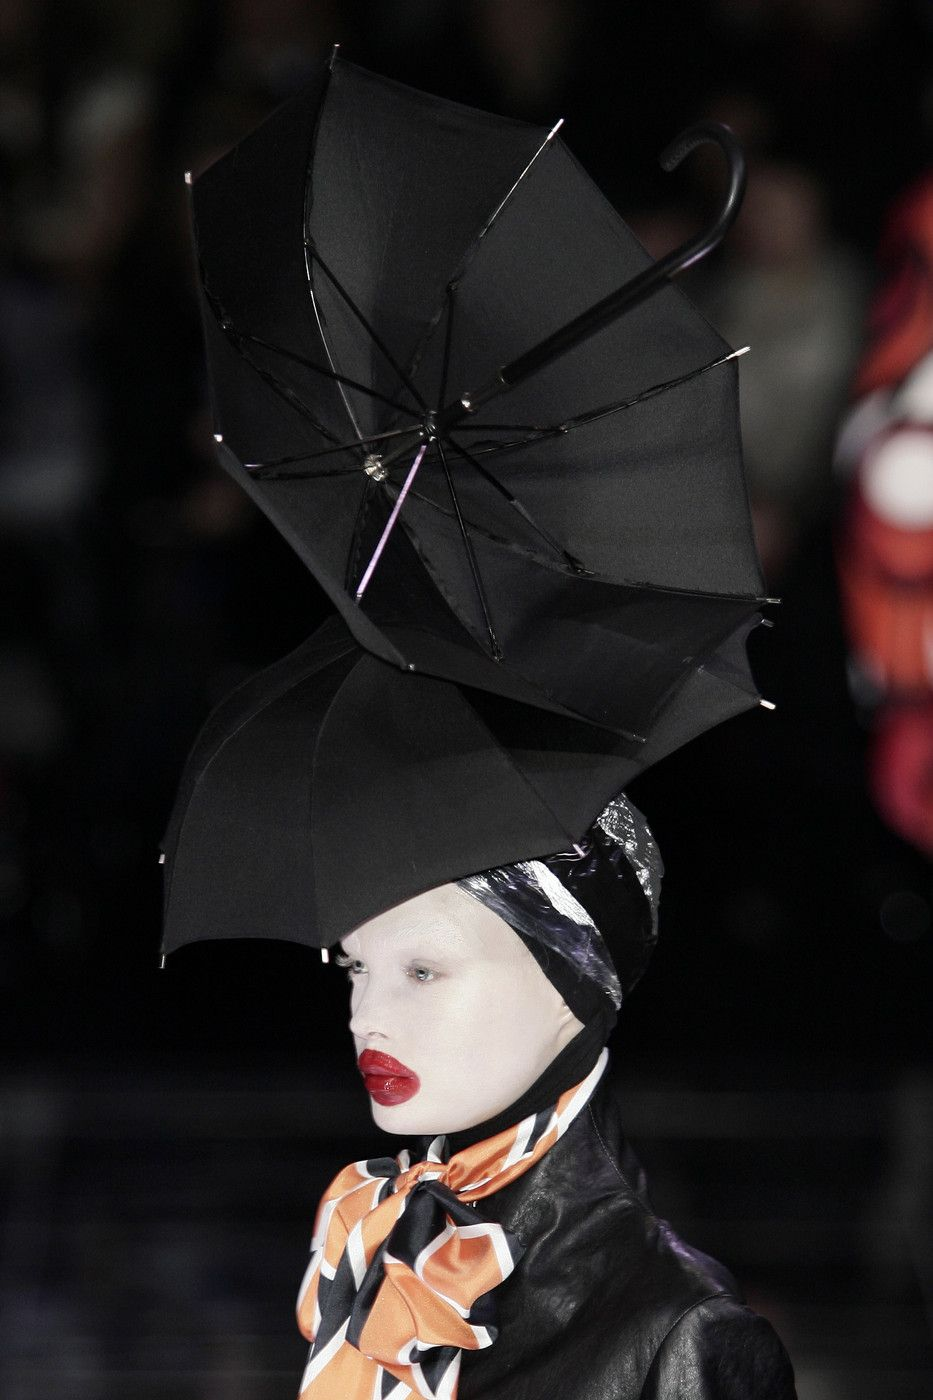 Umbrella Hair in Alexander McQueen Autumn/Winter 2009